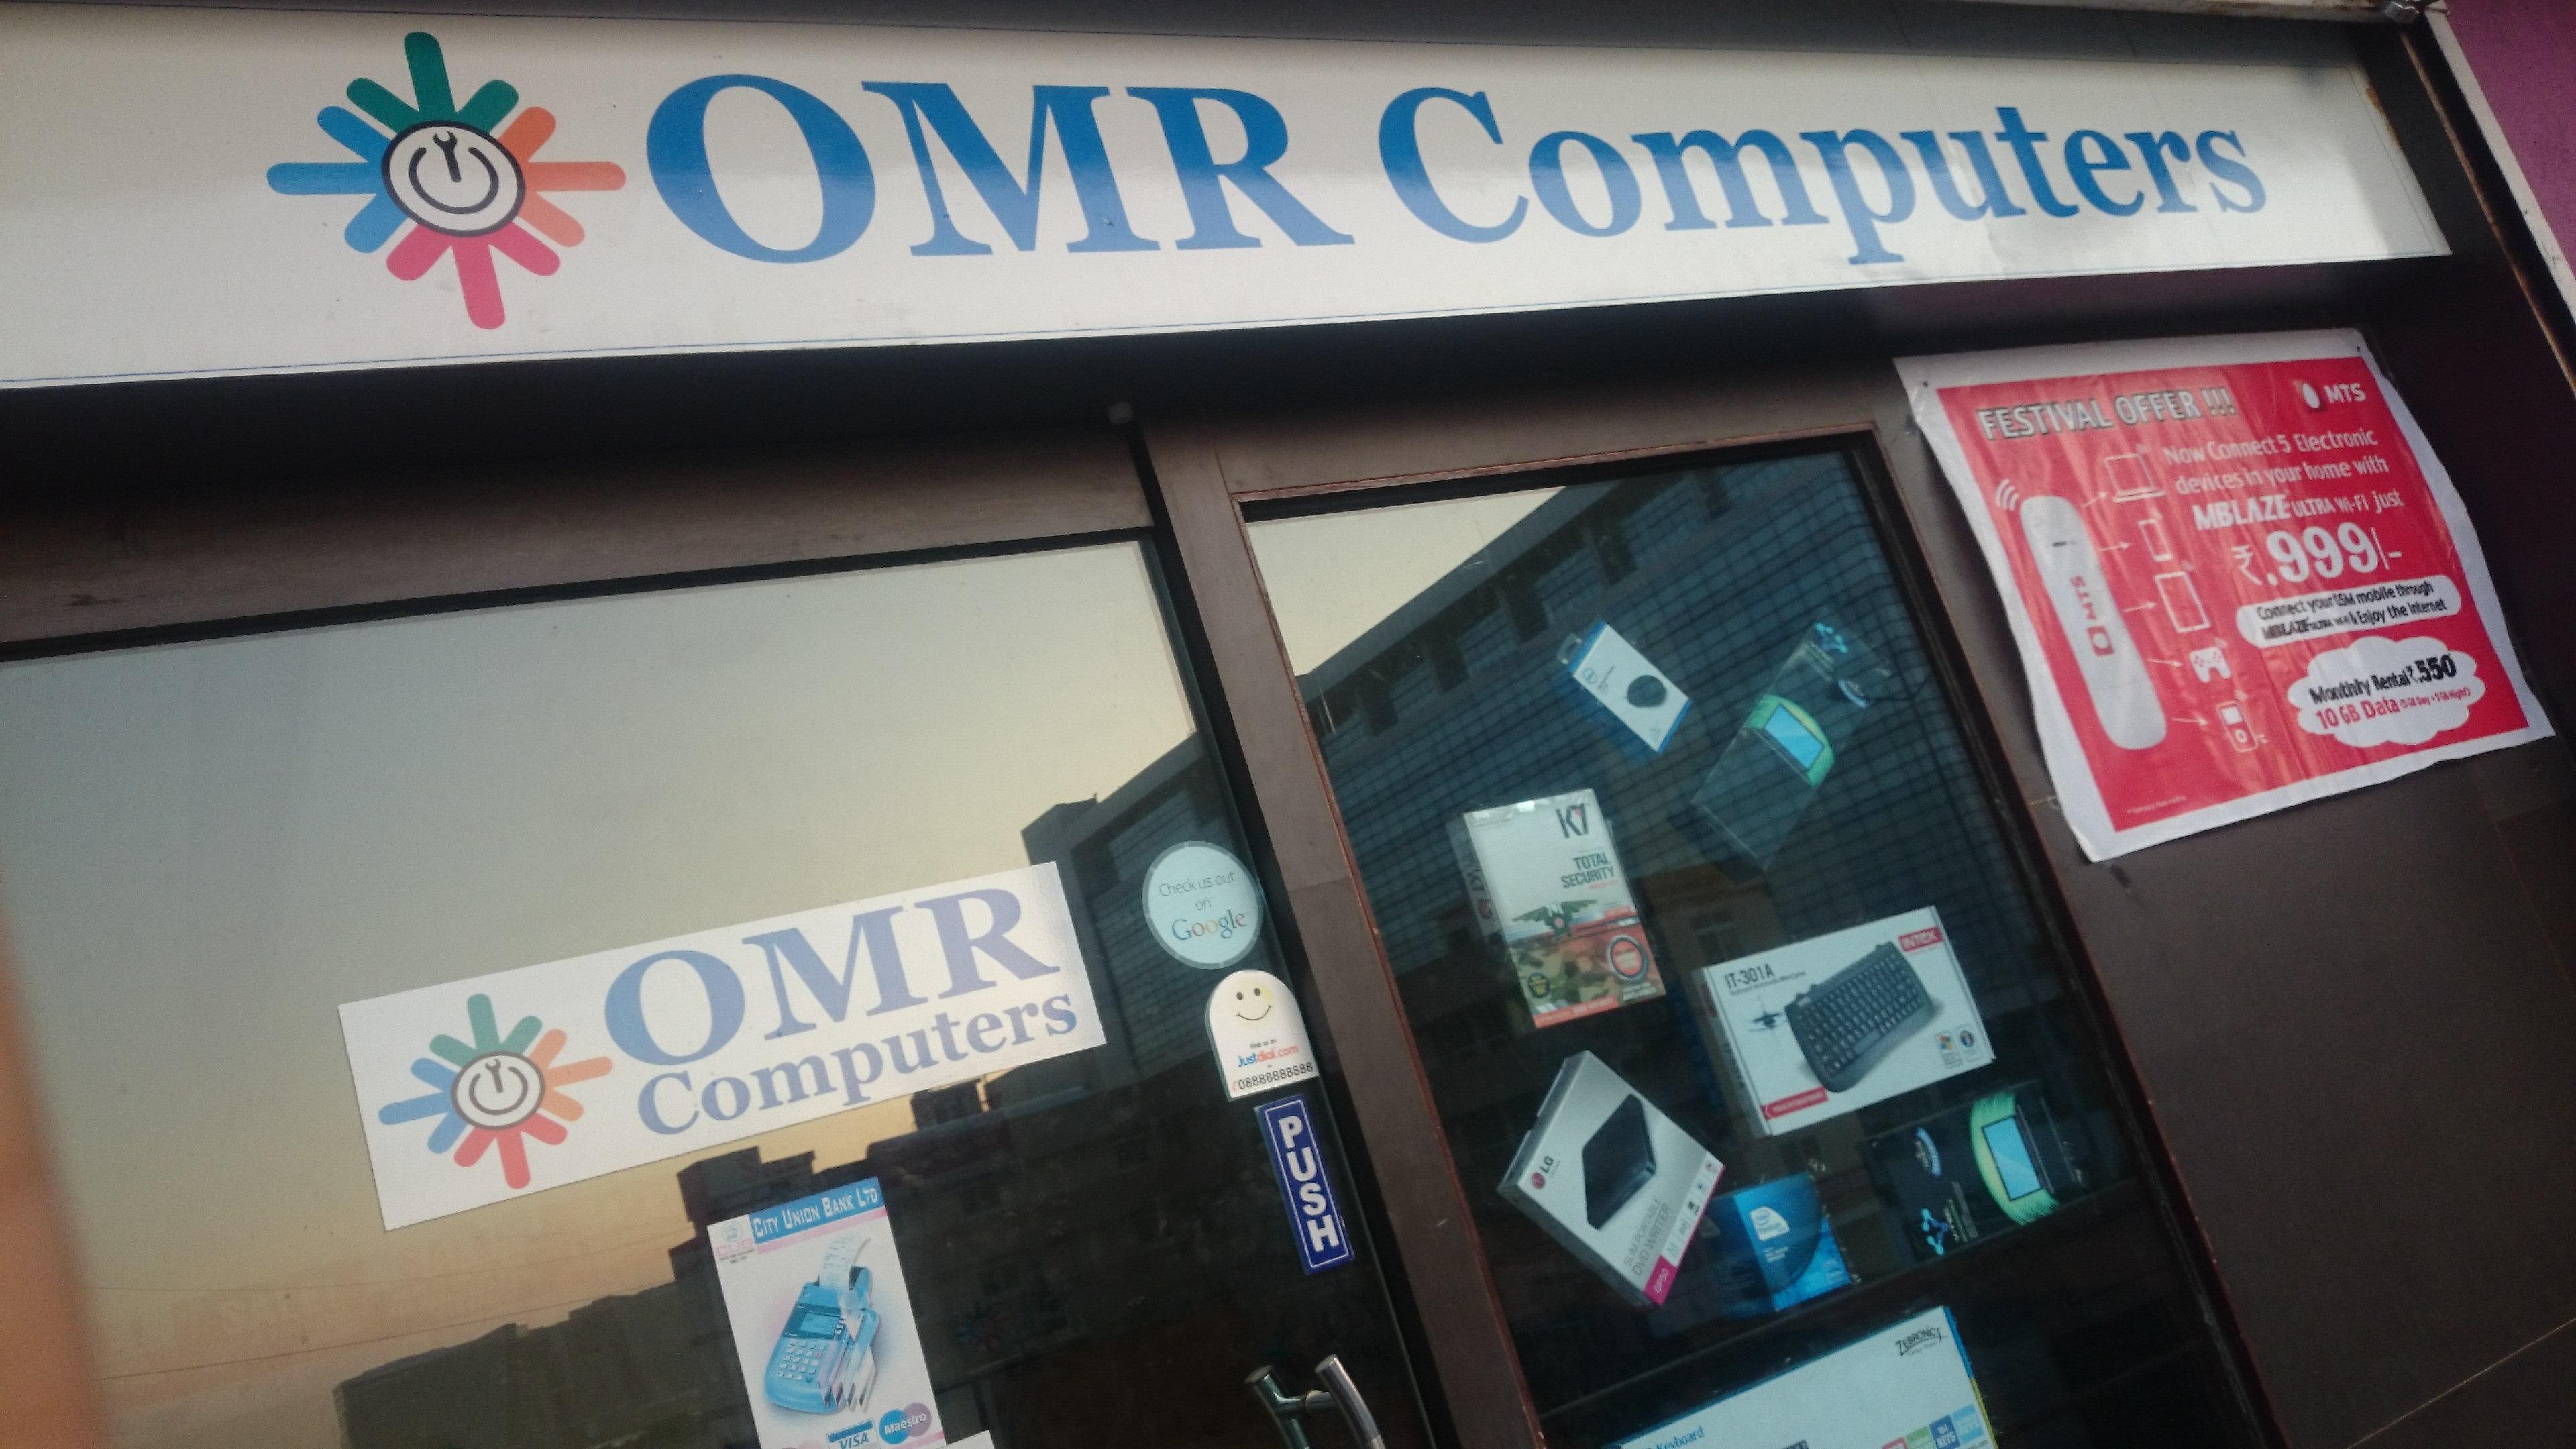 OMR COMPUTERS